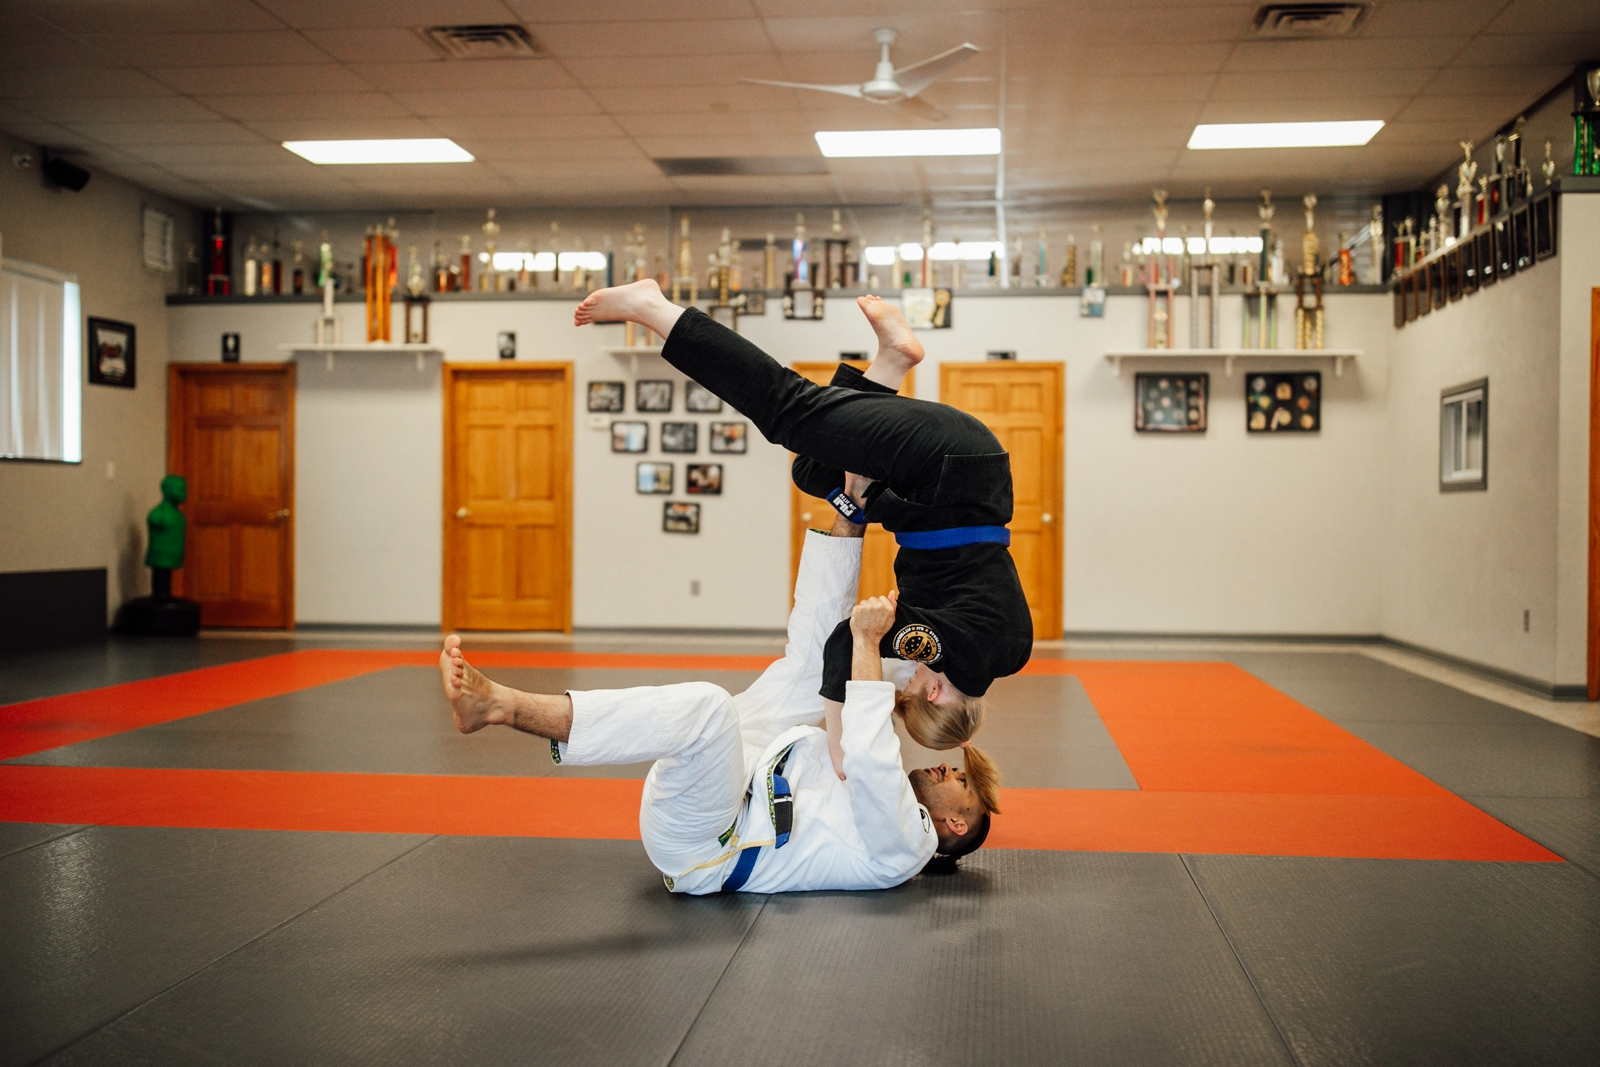 Pittsburgh Engagement Photos Jiu-Jitsu Bloomfield Photographer